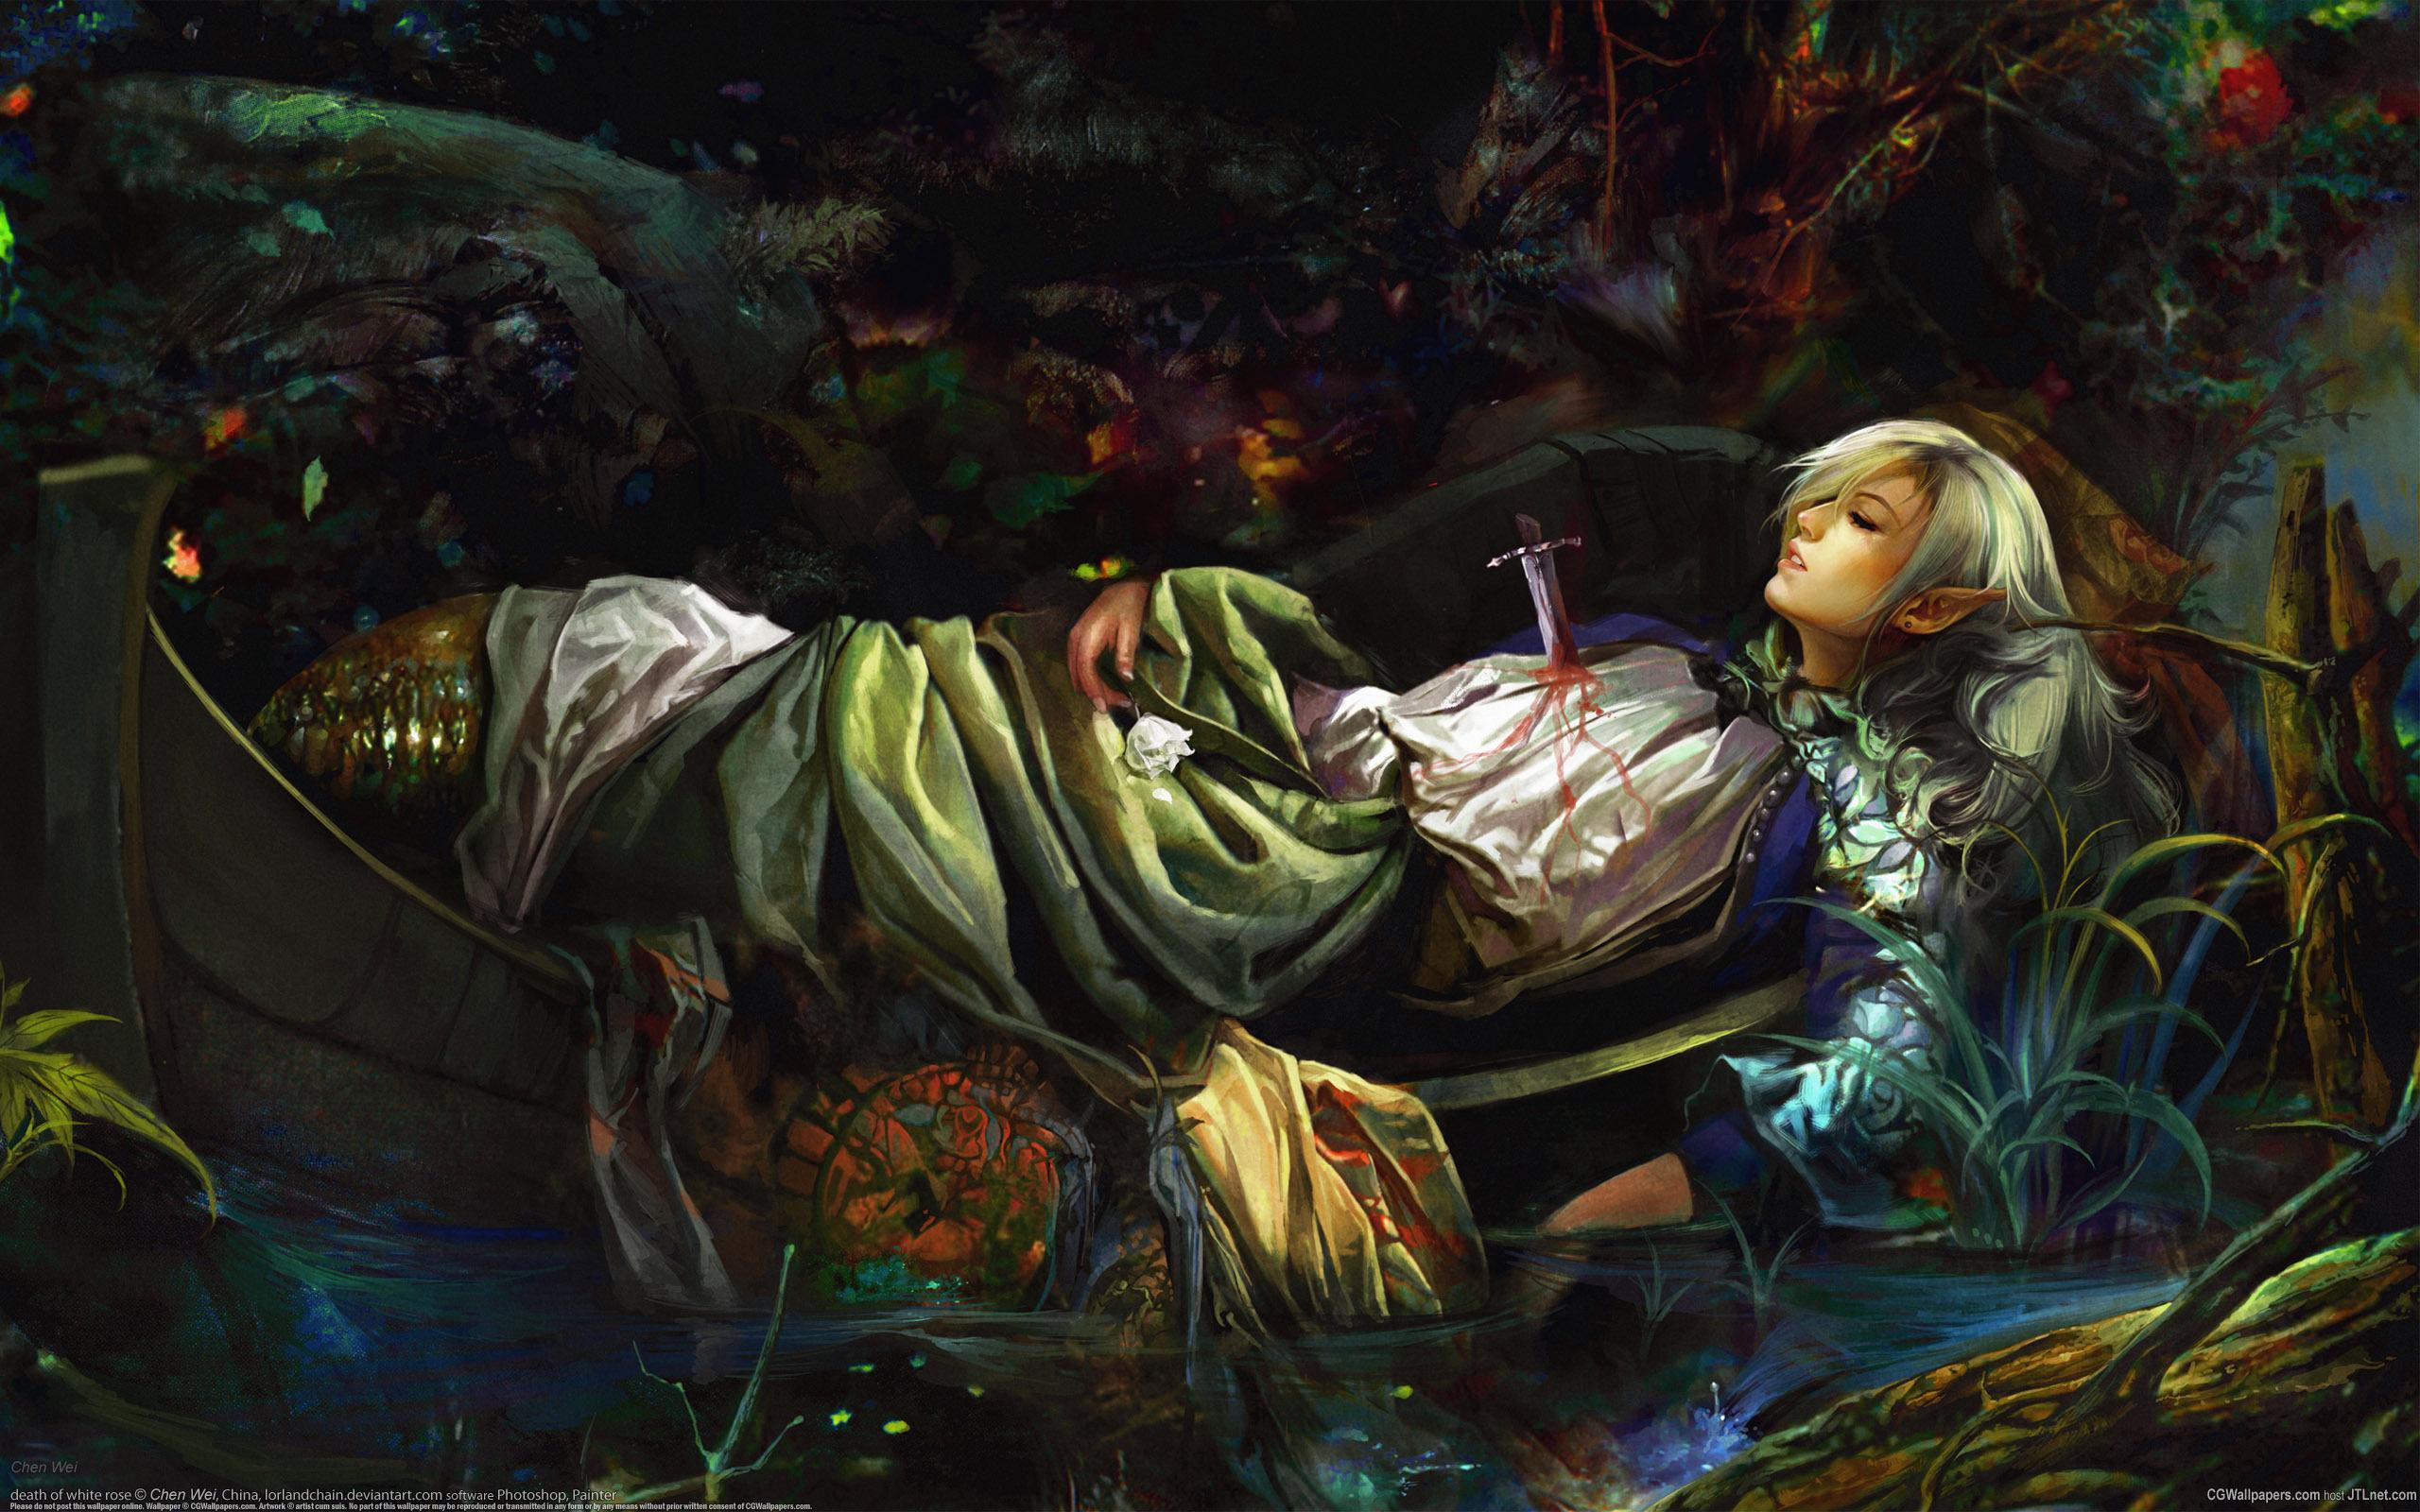 Elf Fantasy wallpaper murder Wallpapers 3d for desktop 3d pictures 2560x1600